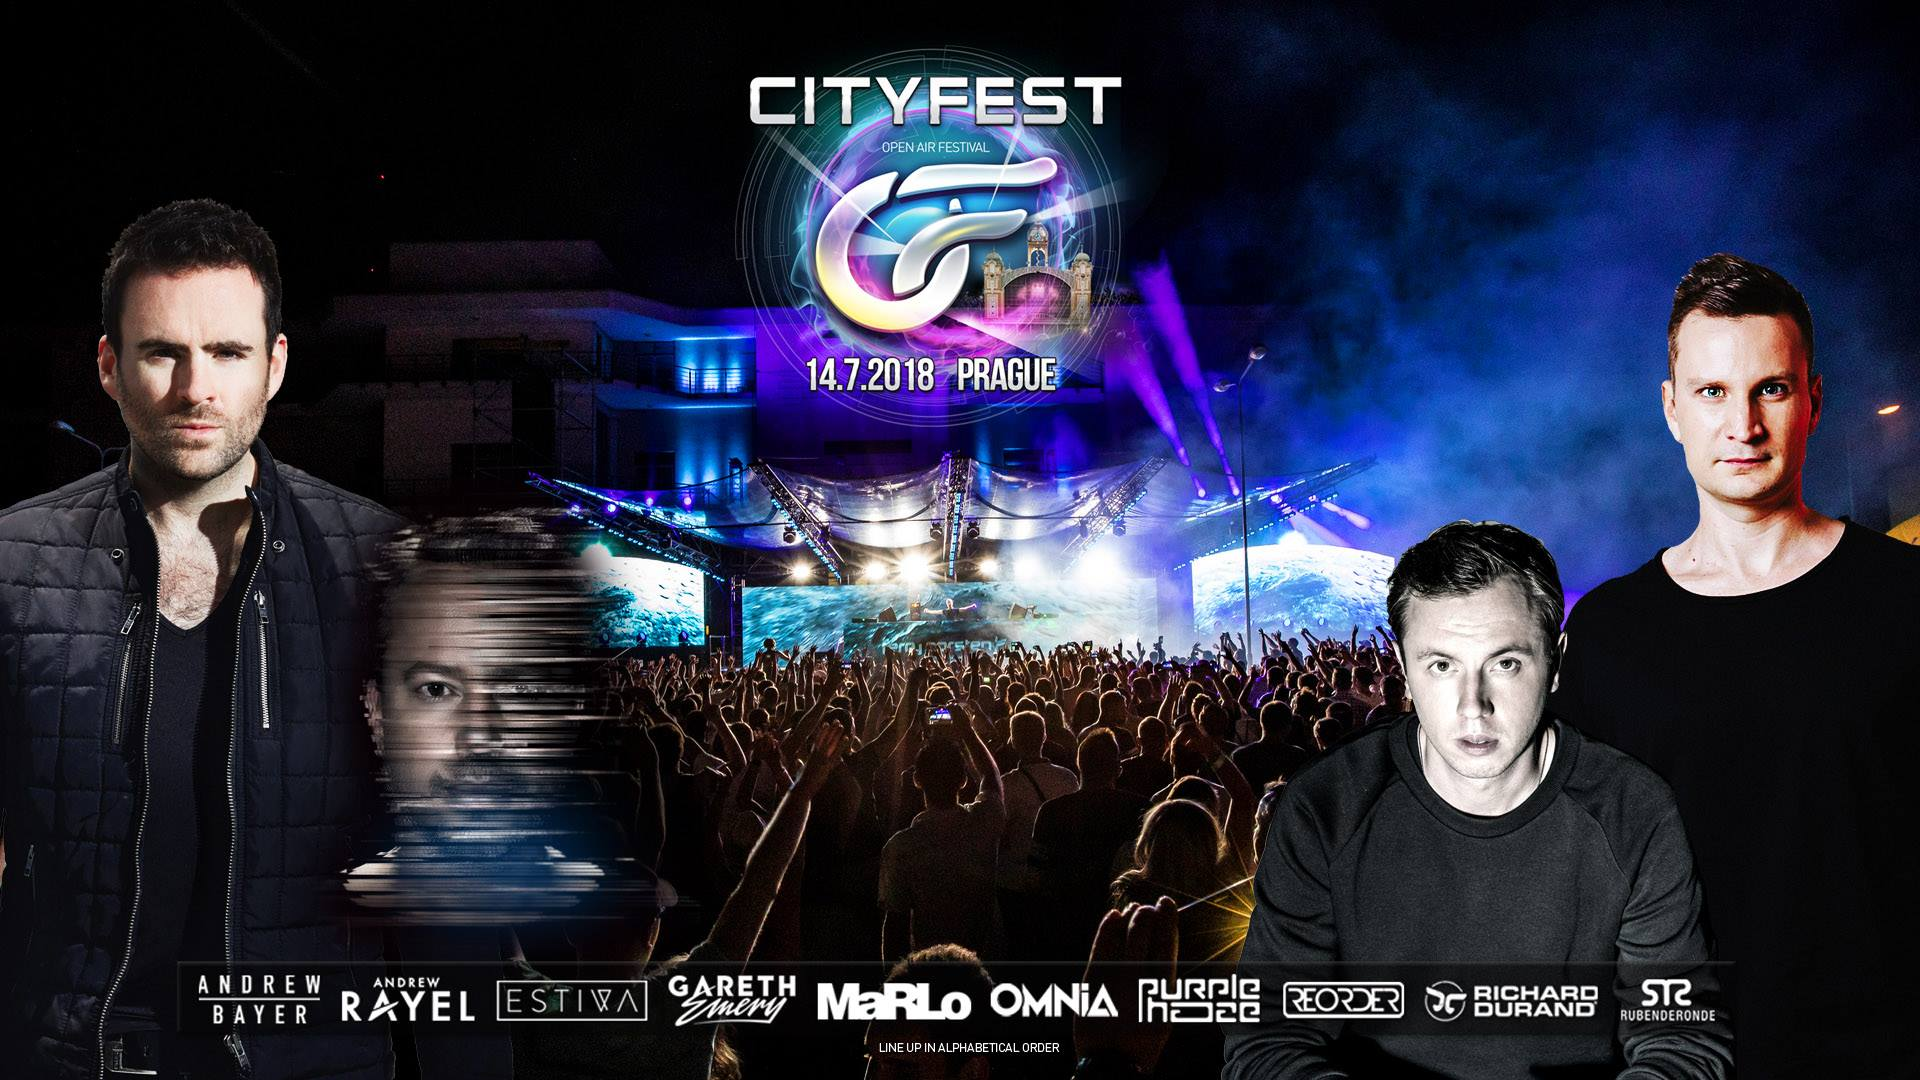 14.07.2018 CityFest 2018, Prague (CZ)